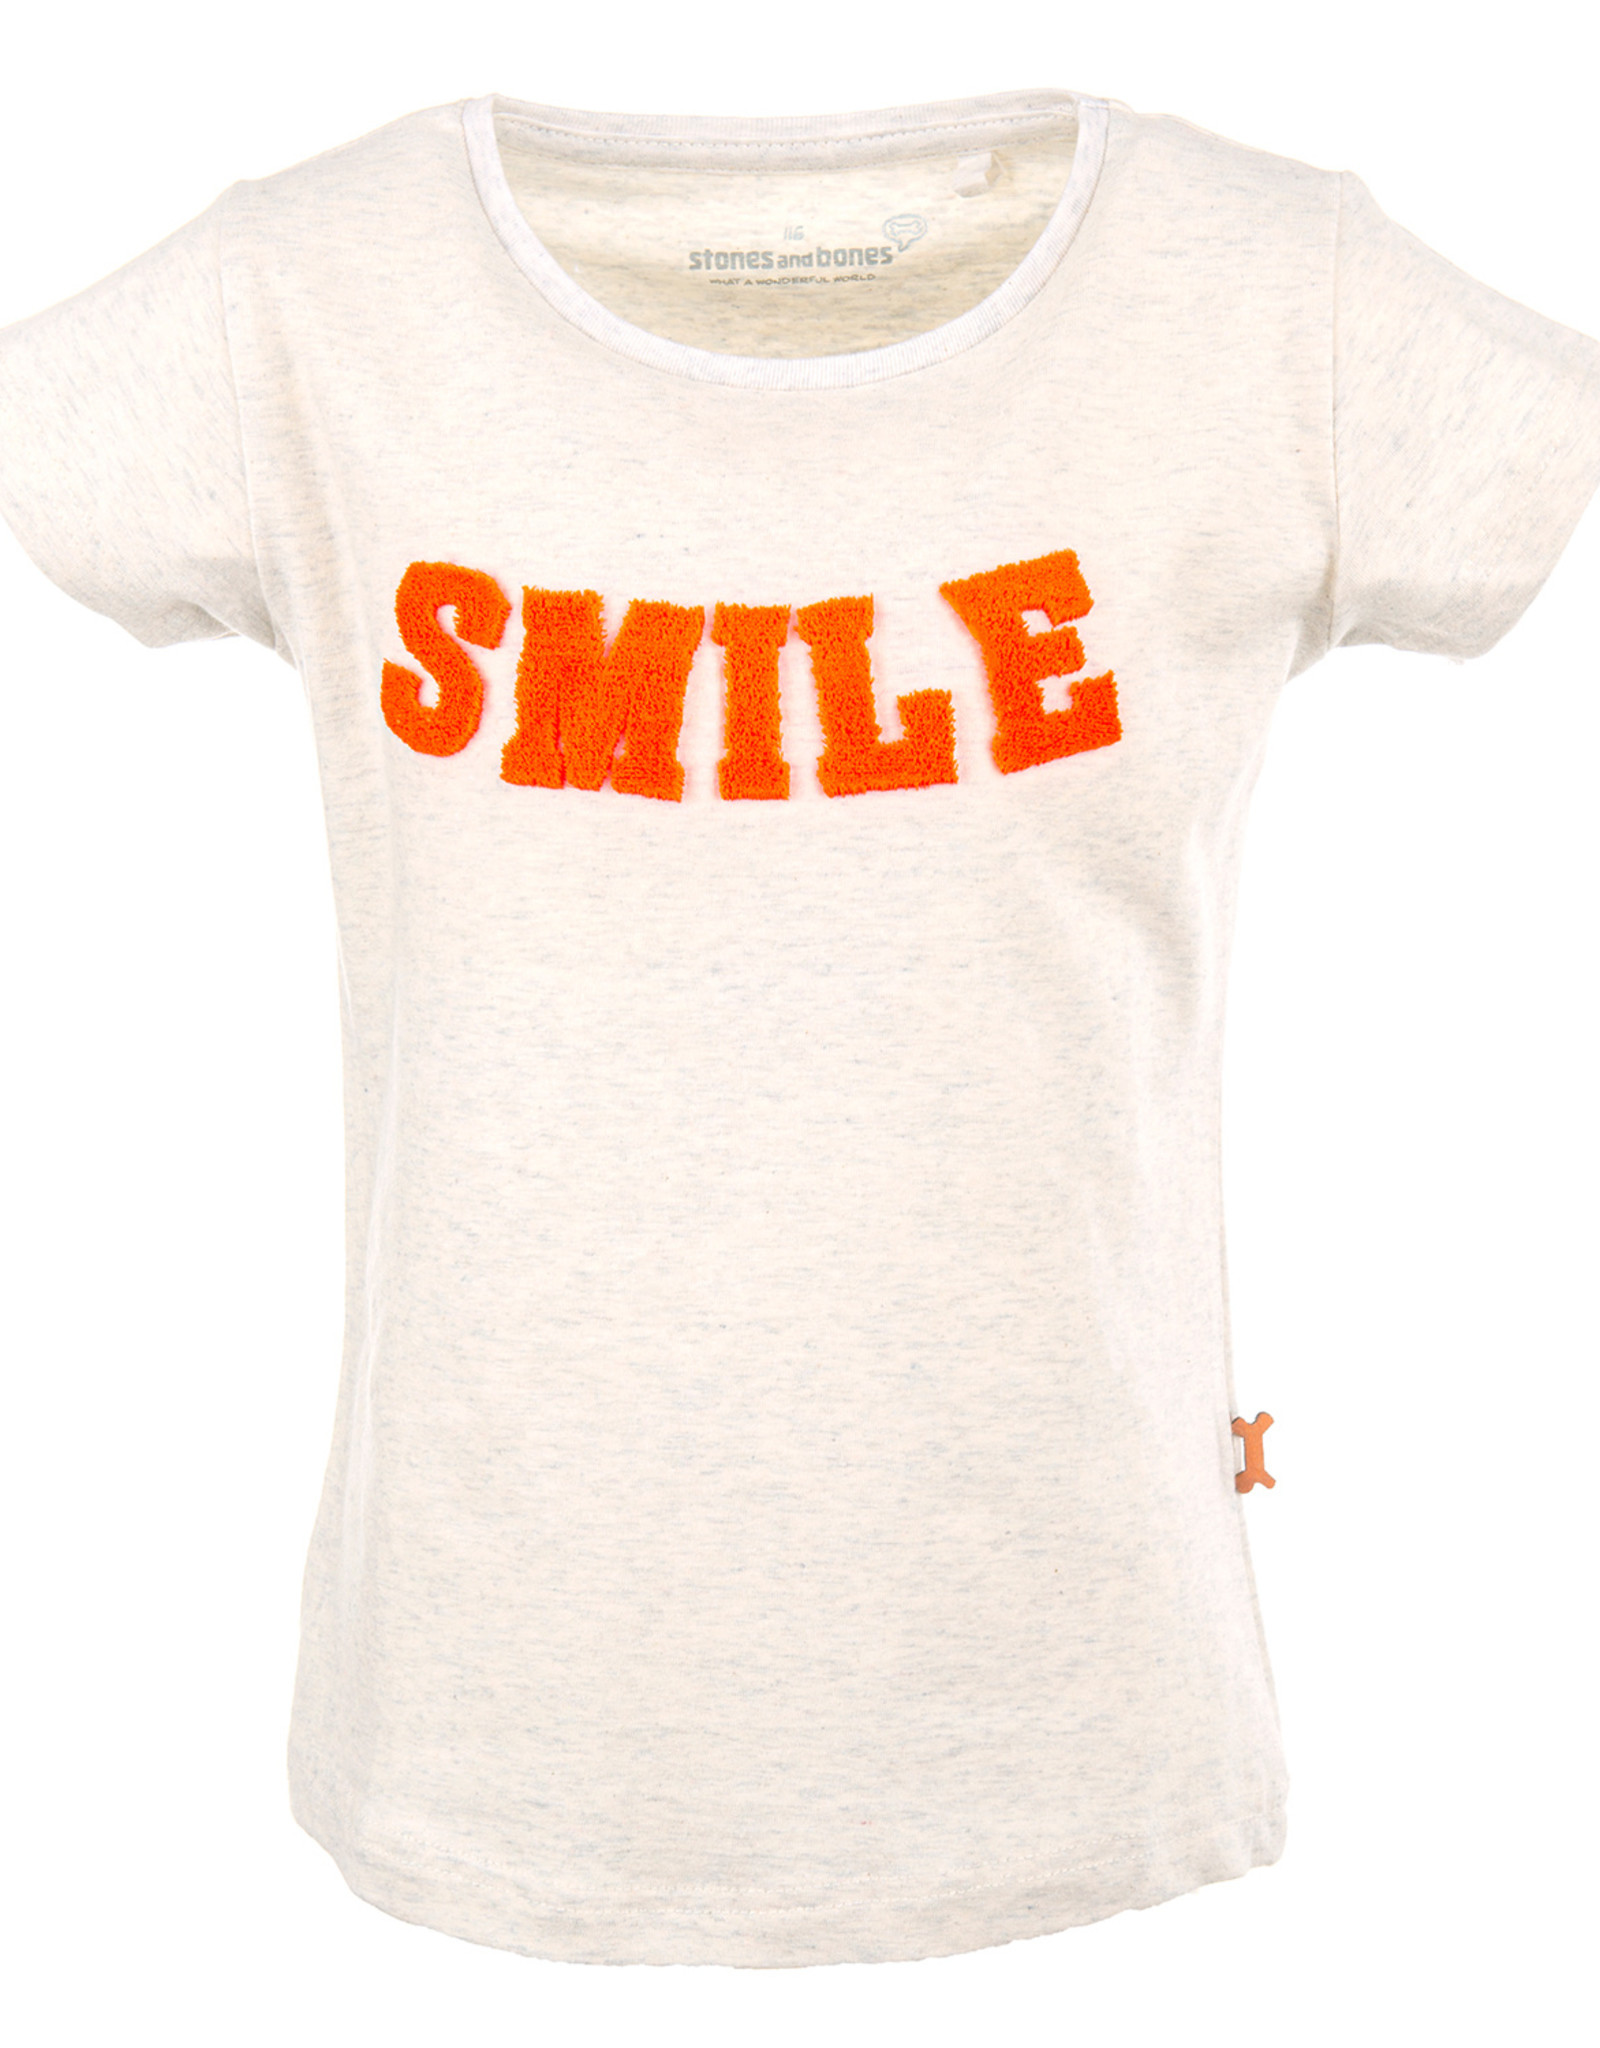 Stones and Bones Stones and Bones 'Camille' Smile ash t-shirt